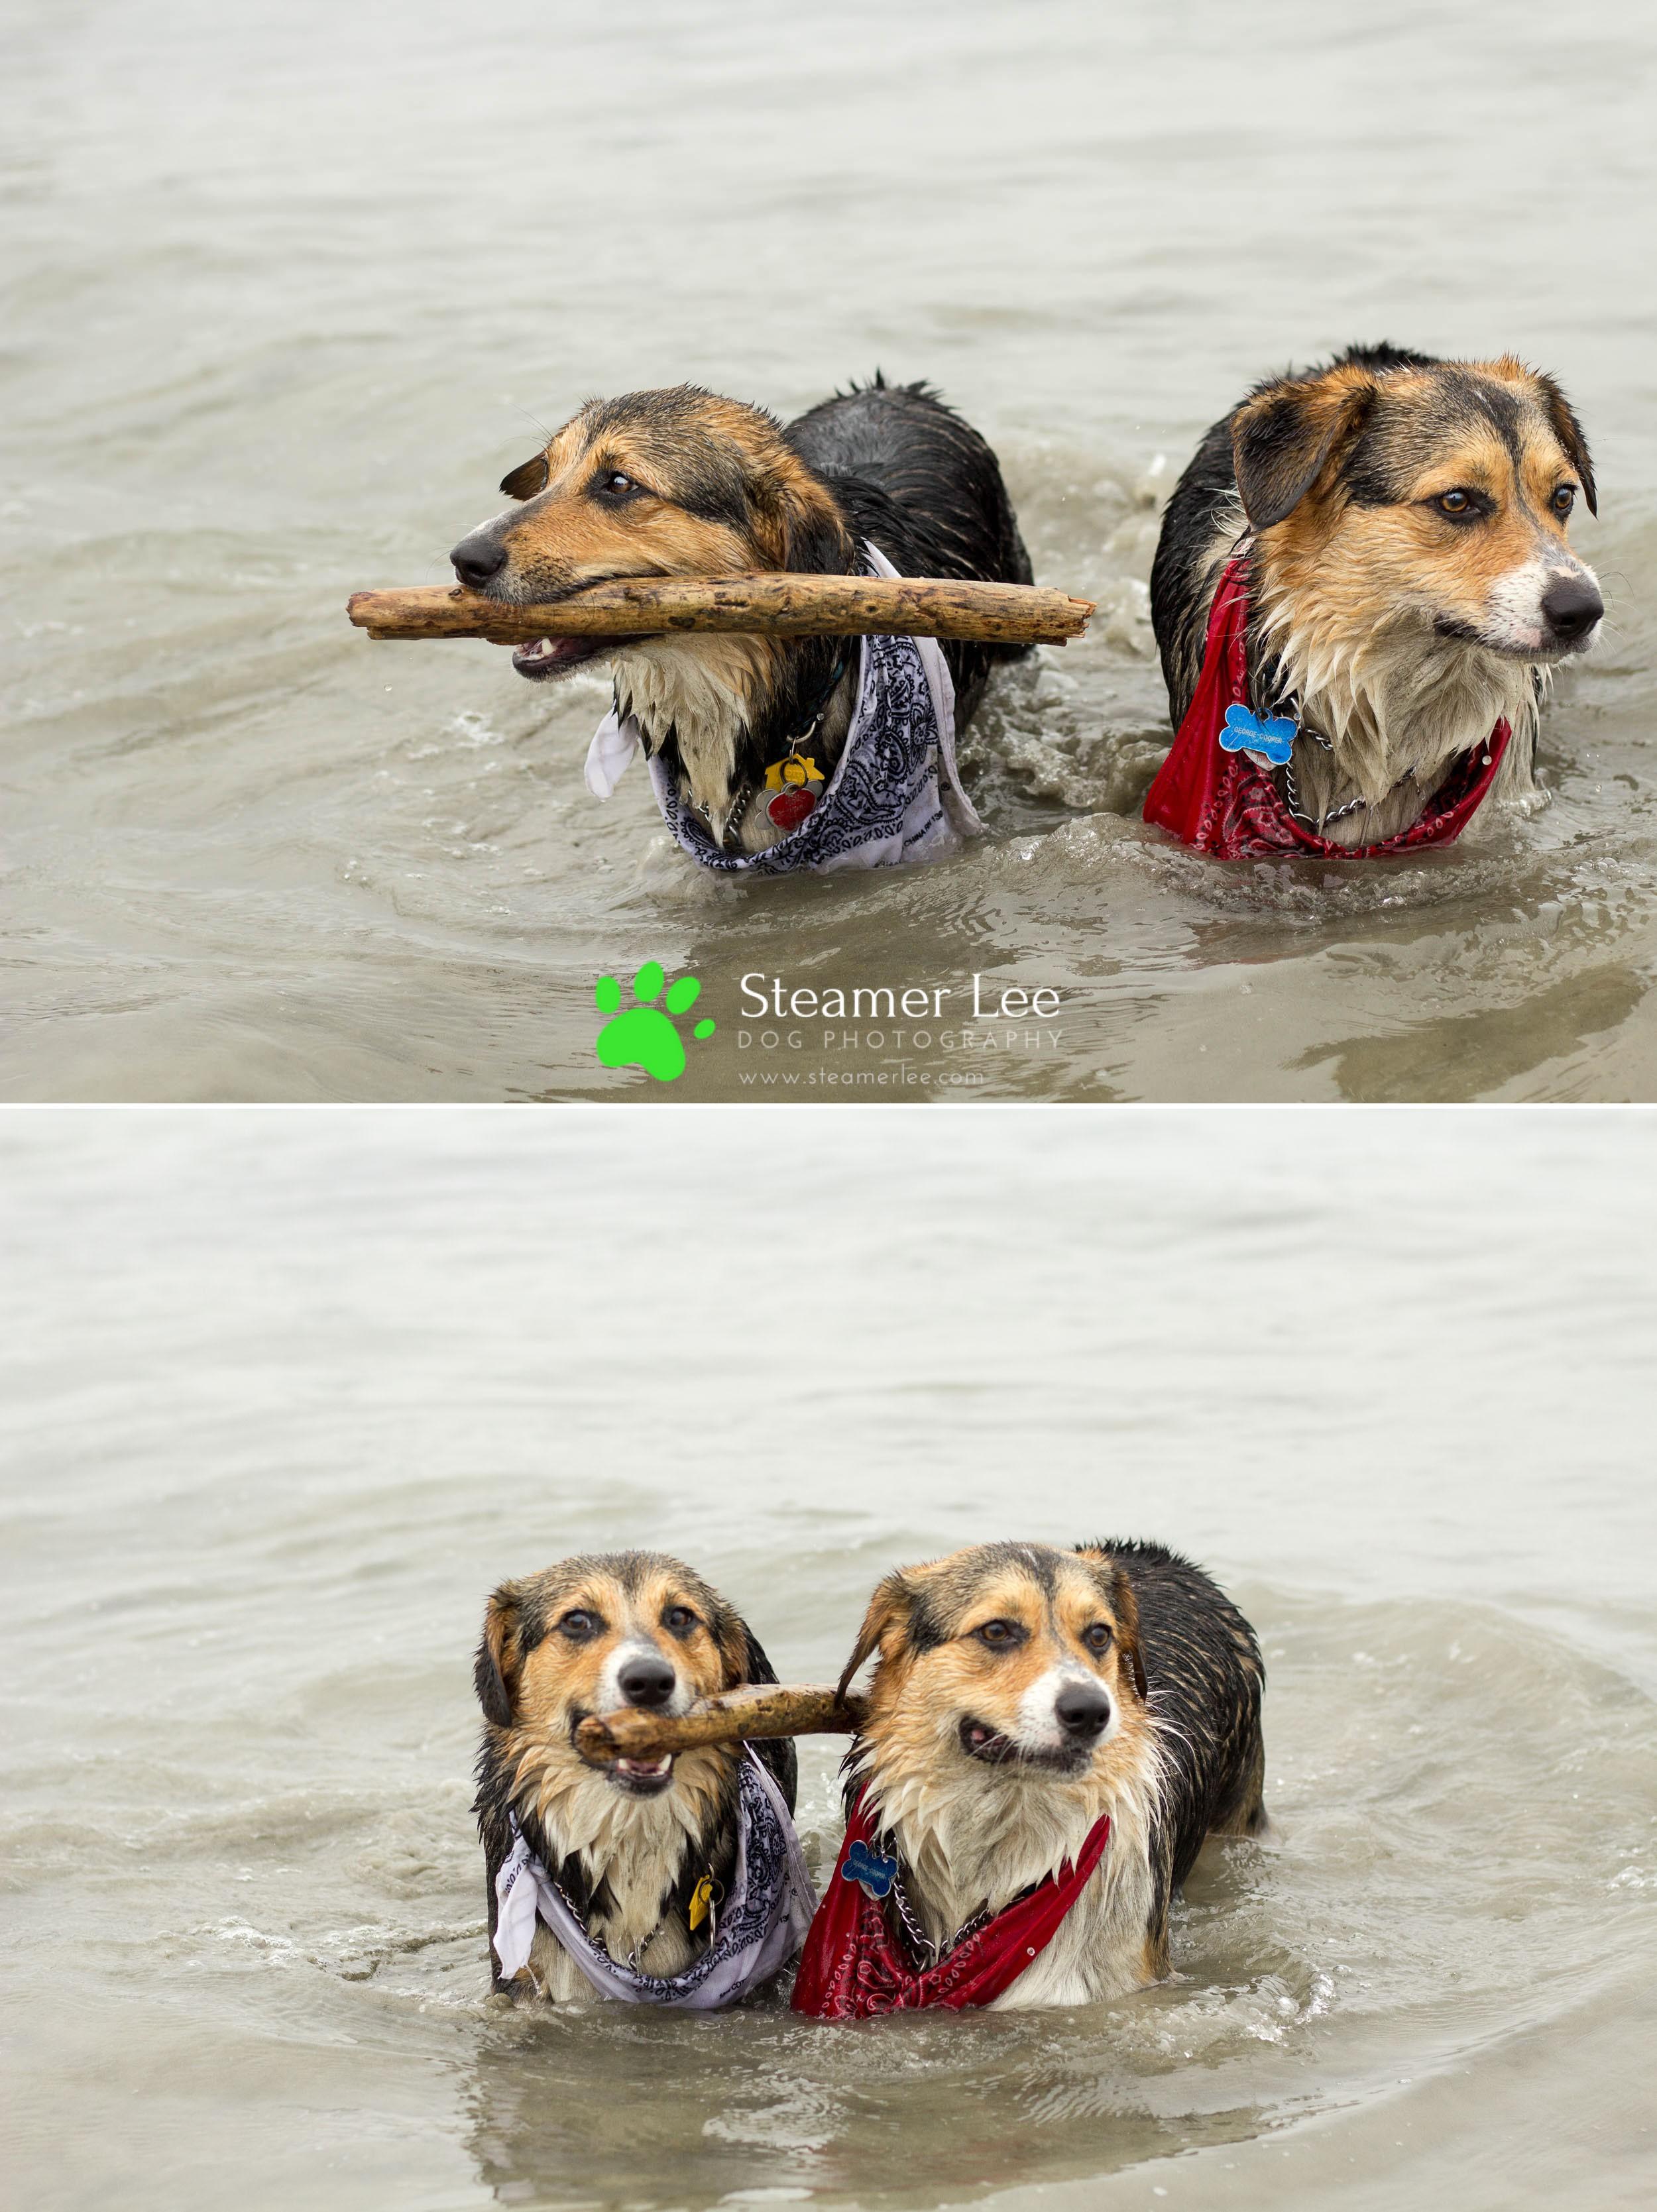 Steamer Lee Dog Photography - July 2017 So Cal Corgi Beach Day - Vol.2 - 6.jpg